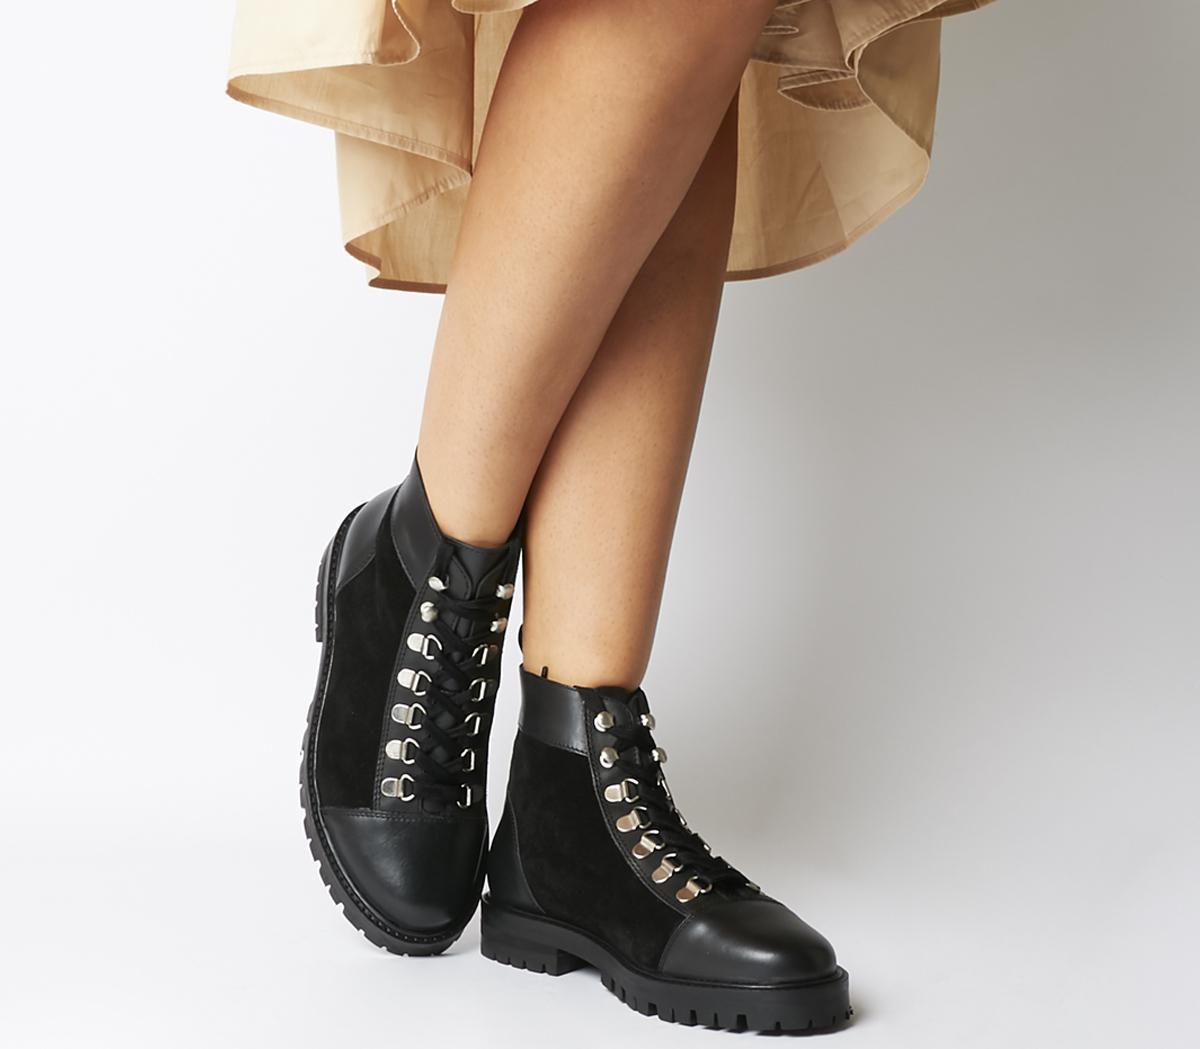 Office Antics Low Hiker Boots Black